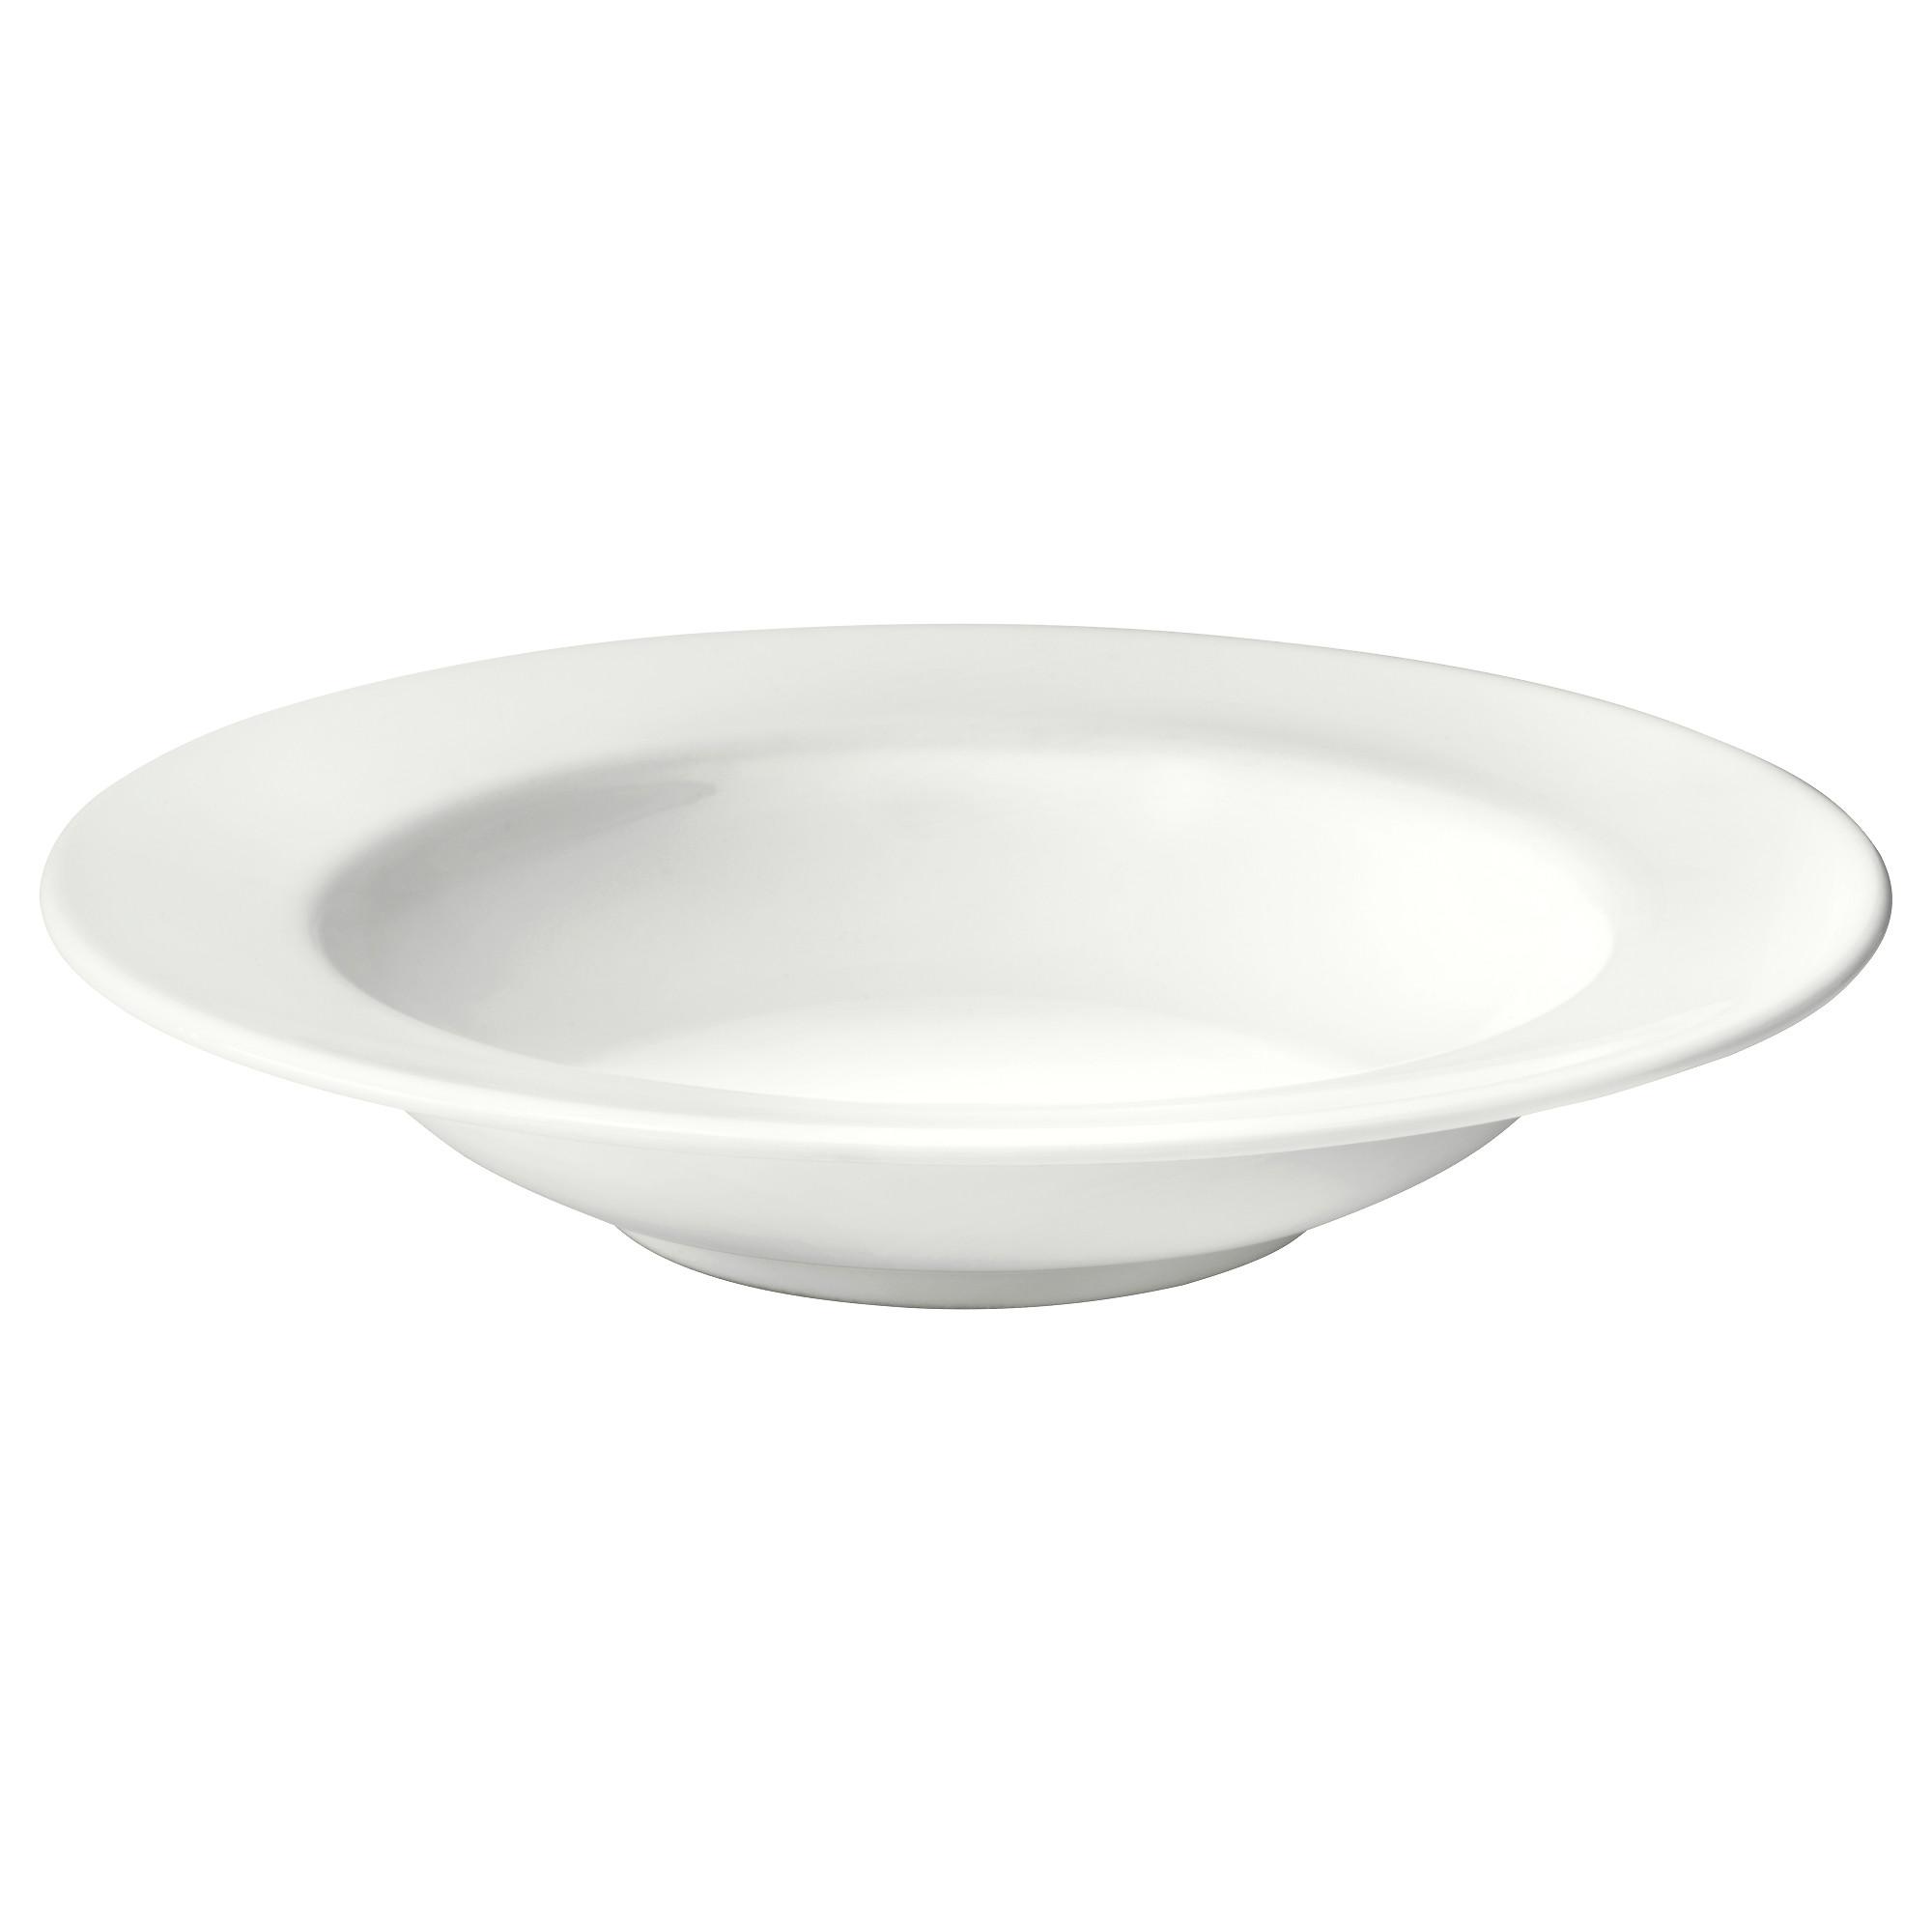 Vardagen Deep Plate Off White 23cm Ikea Hong Kong And Macau